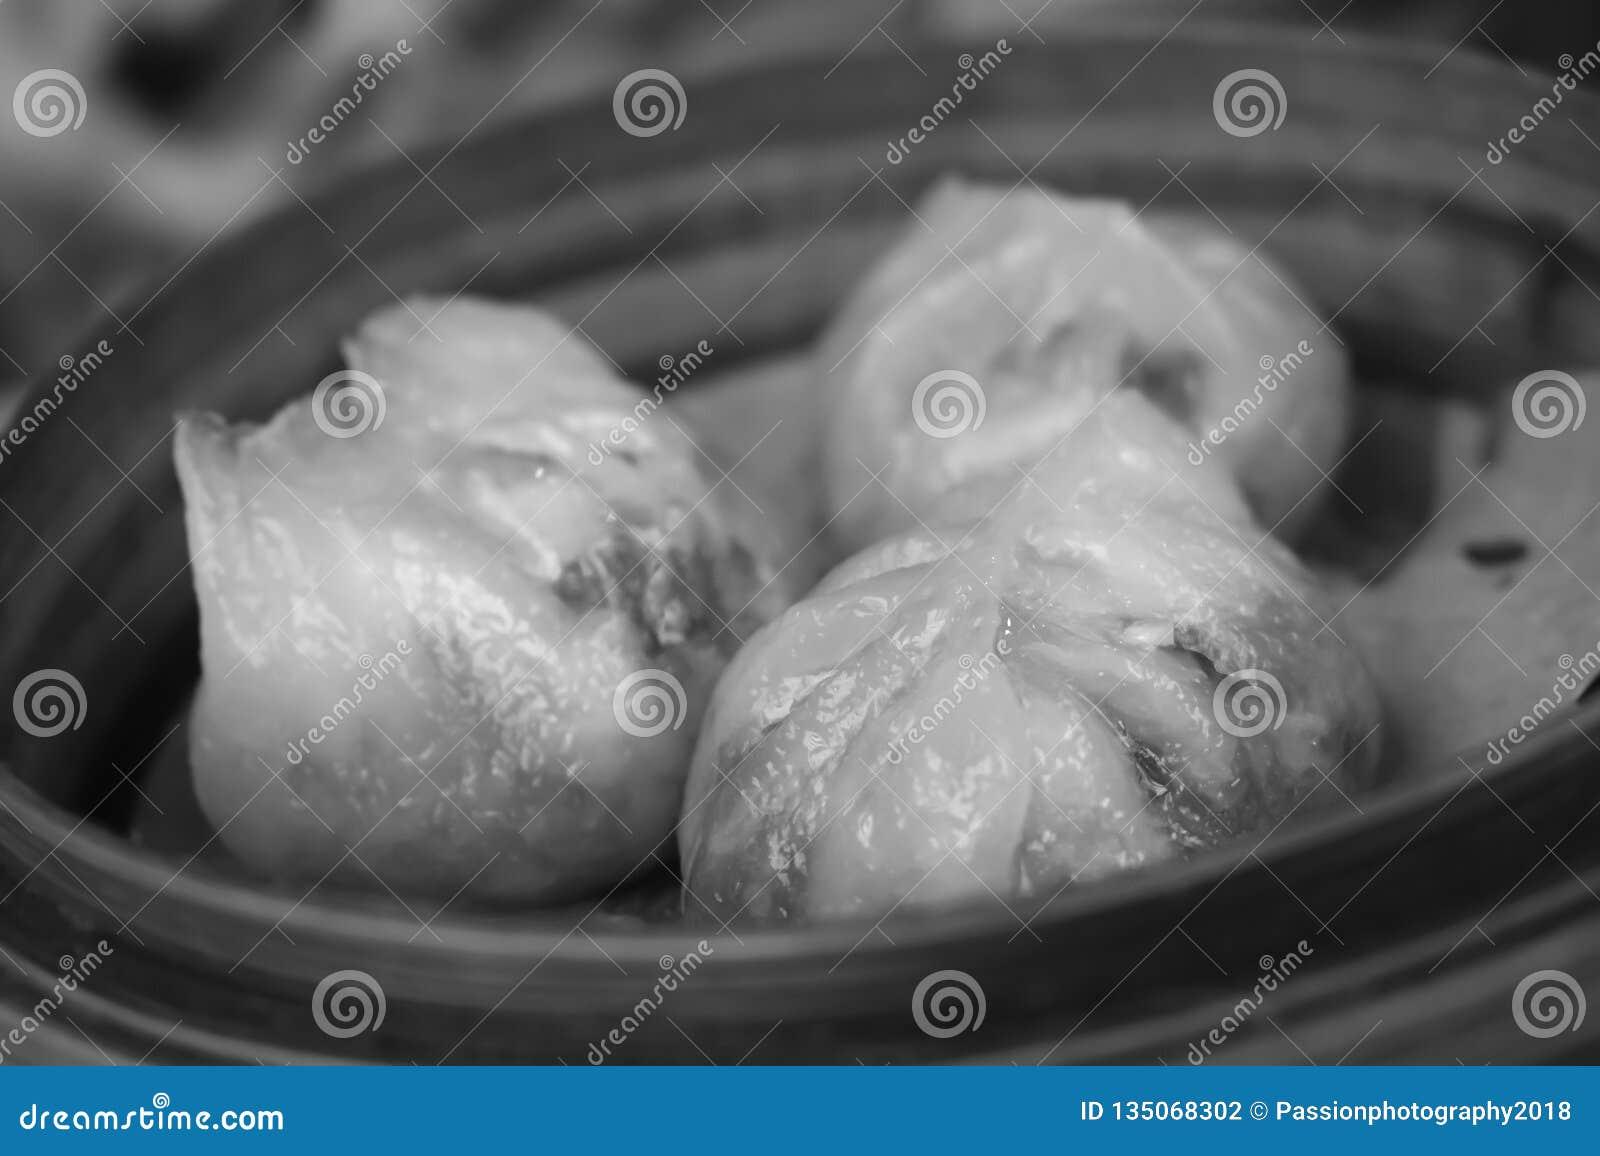 Three dim sum steam dumplings in Hong Kong